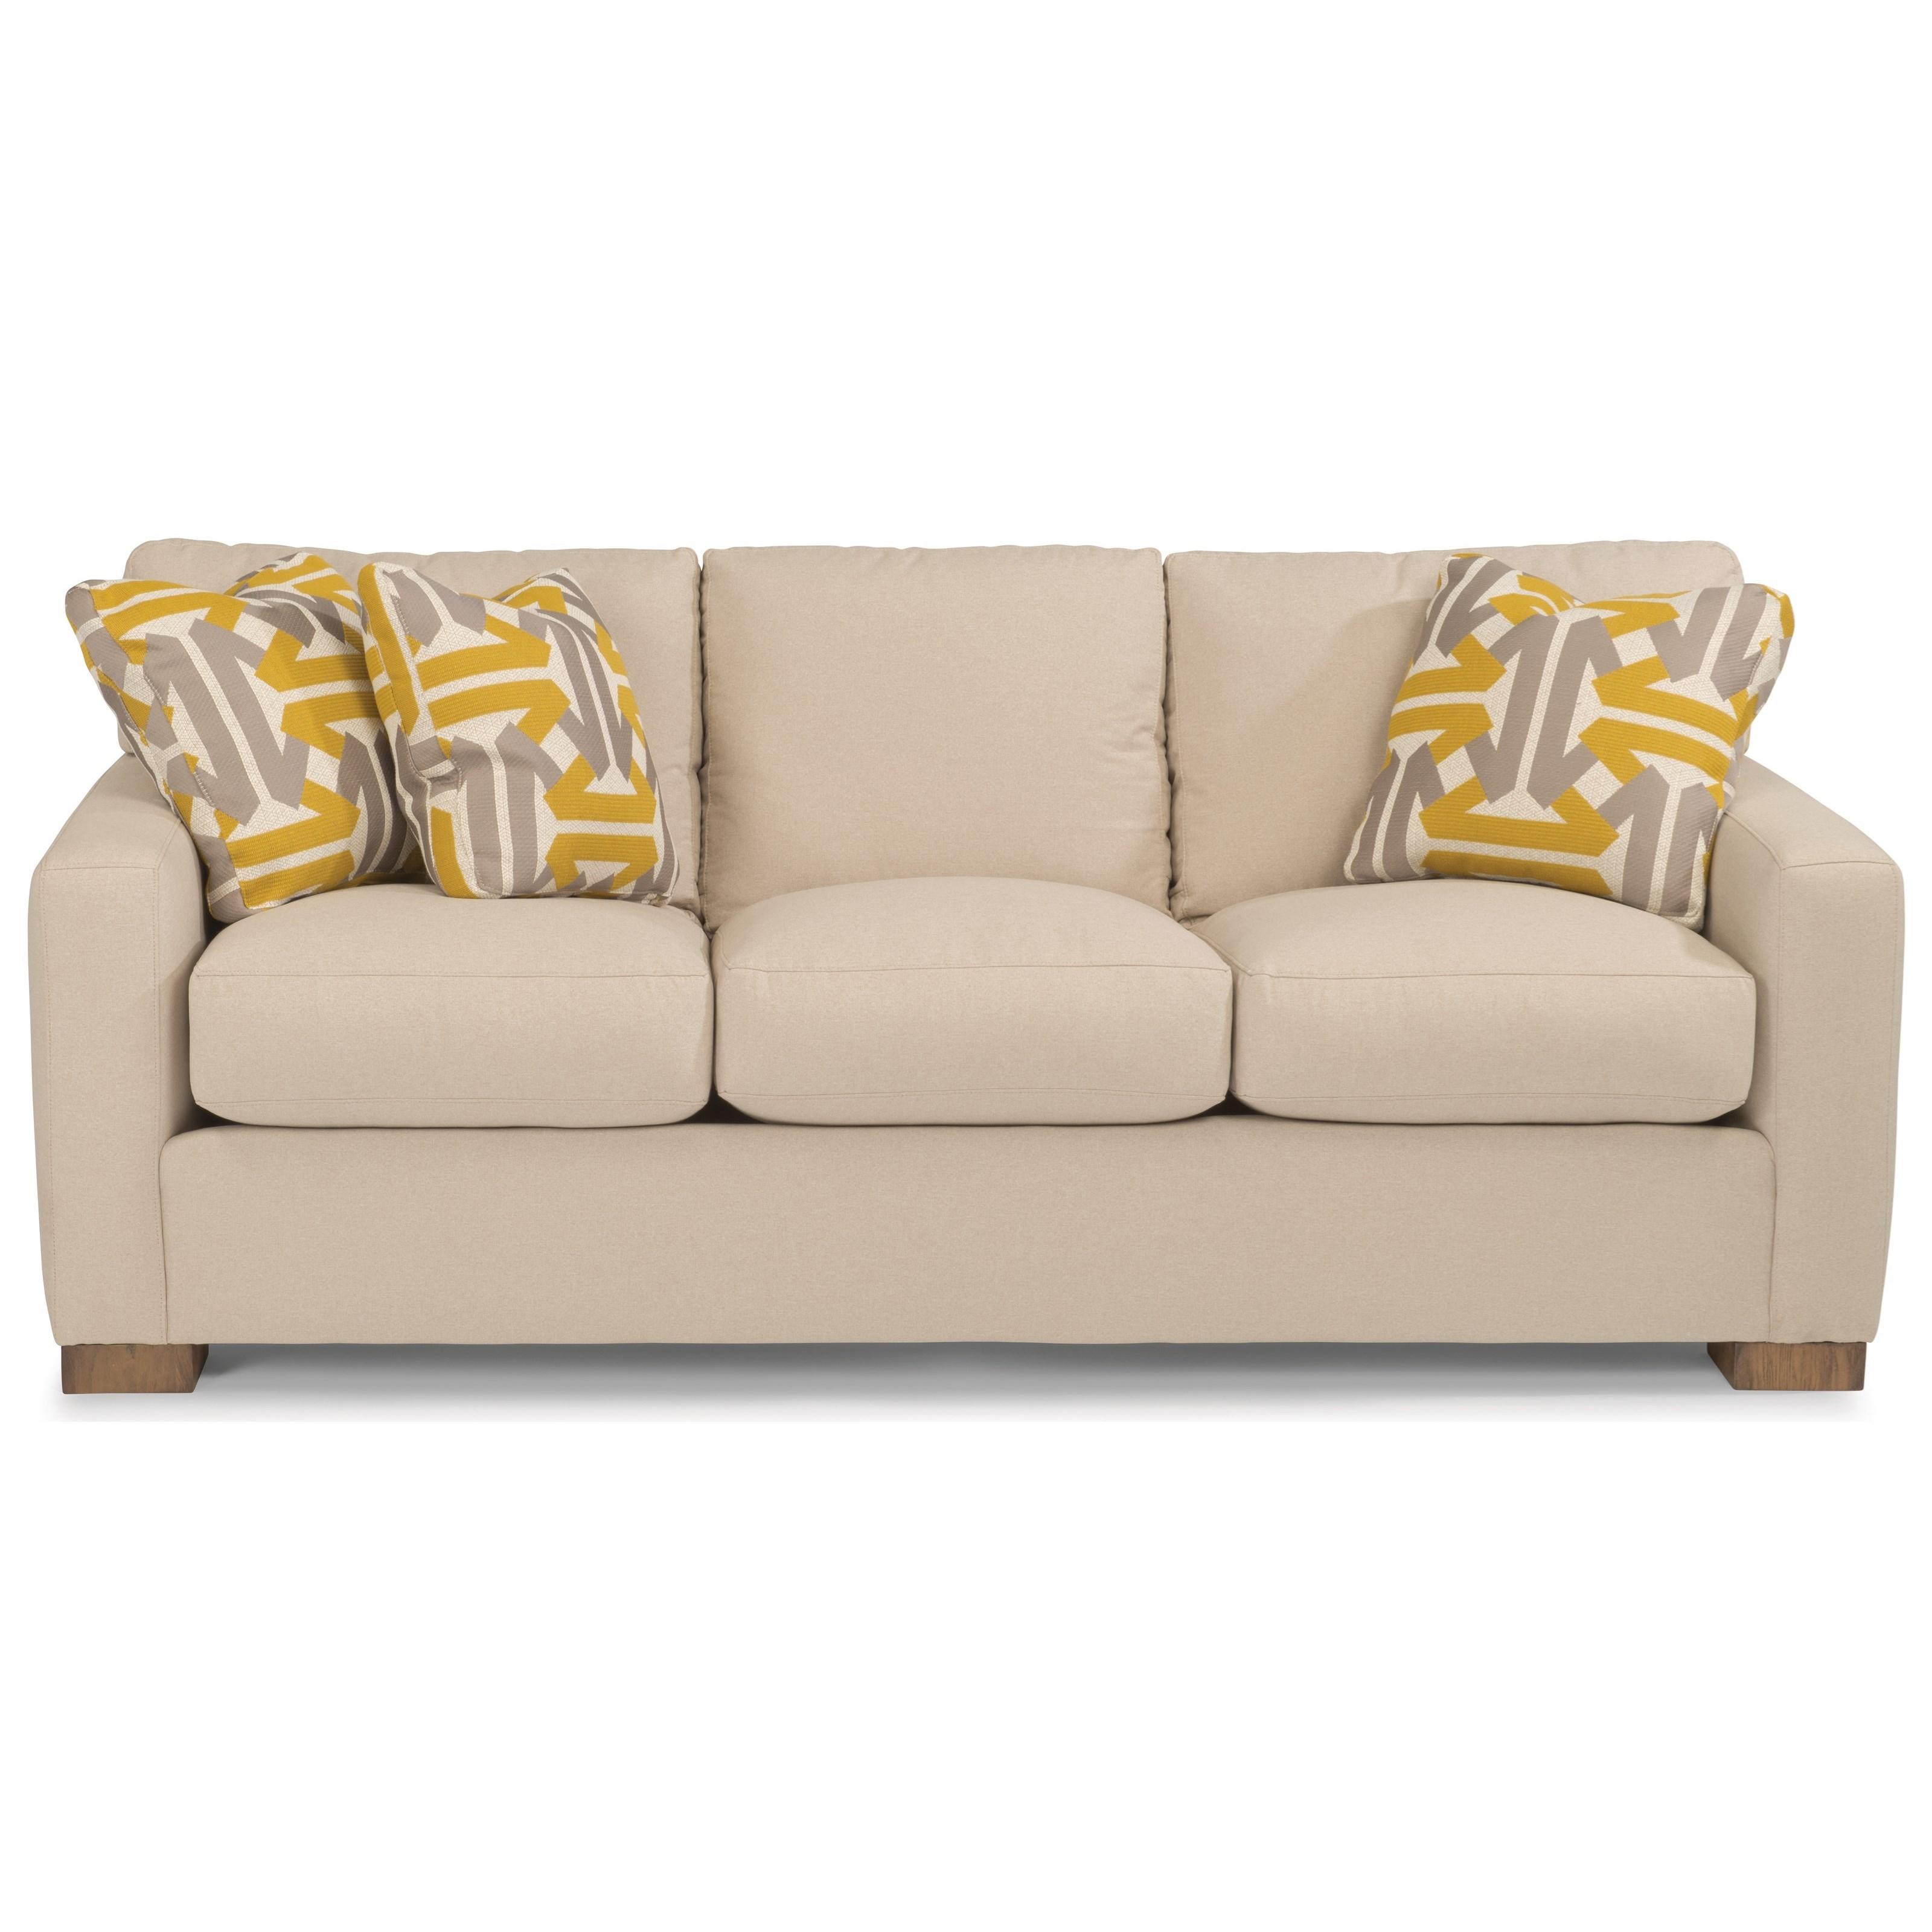 Landon Sofa by Flexsteel at Crowley Furniture & Mattress